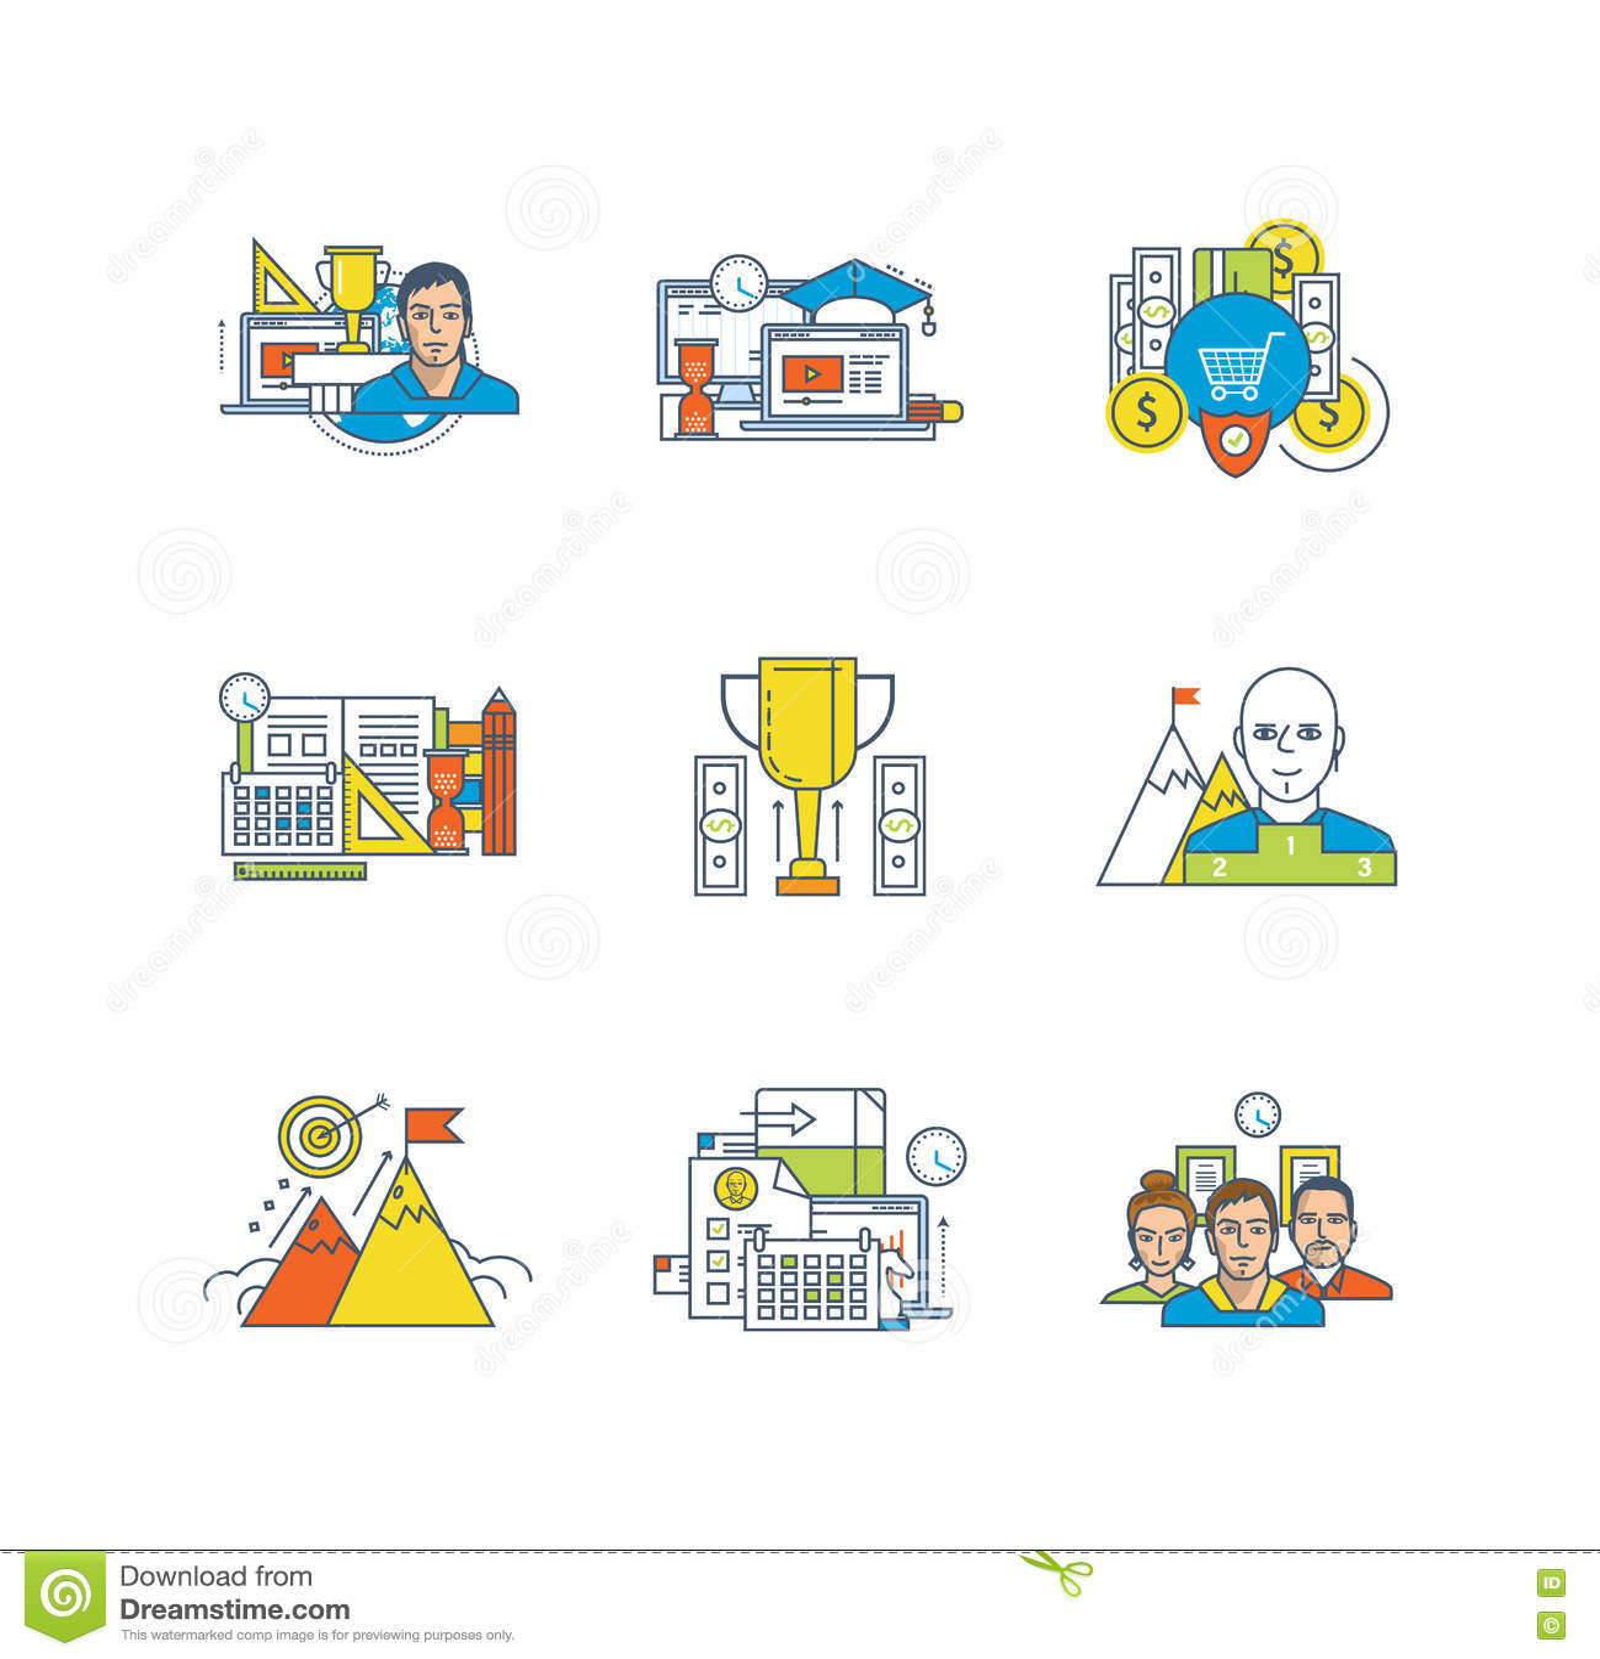 business management education leadership qualities school business management education leadership qualities school disciplines purpose motivation